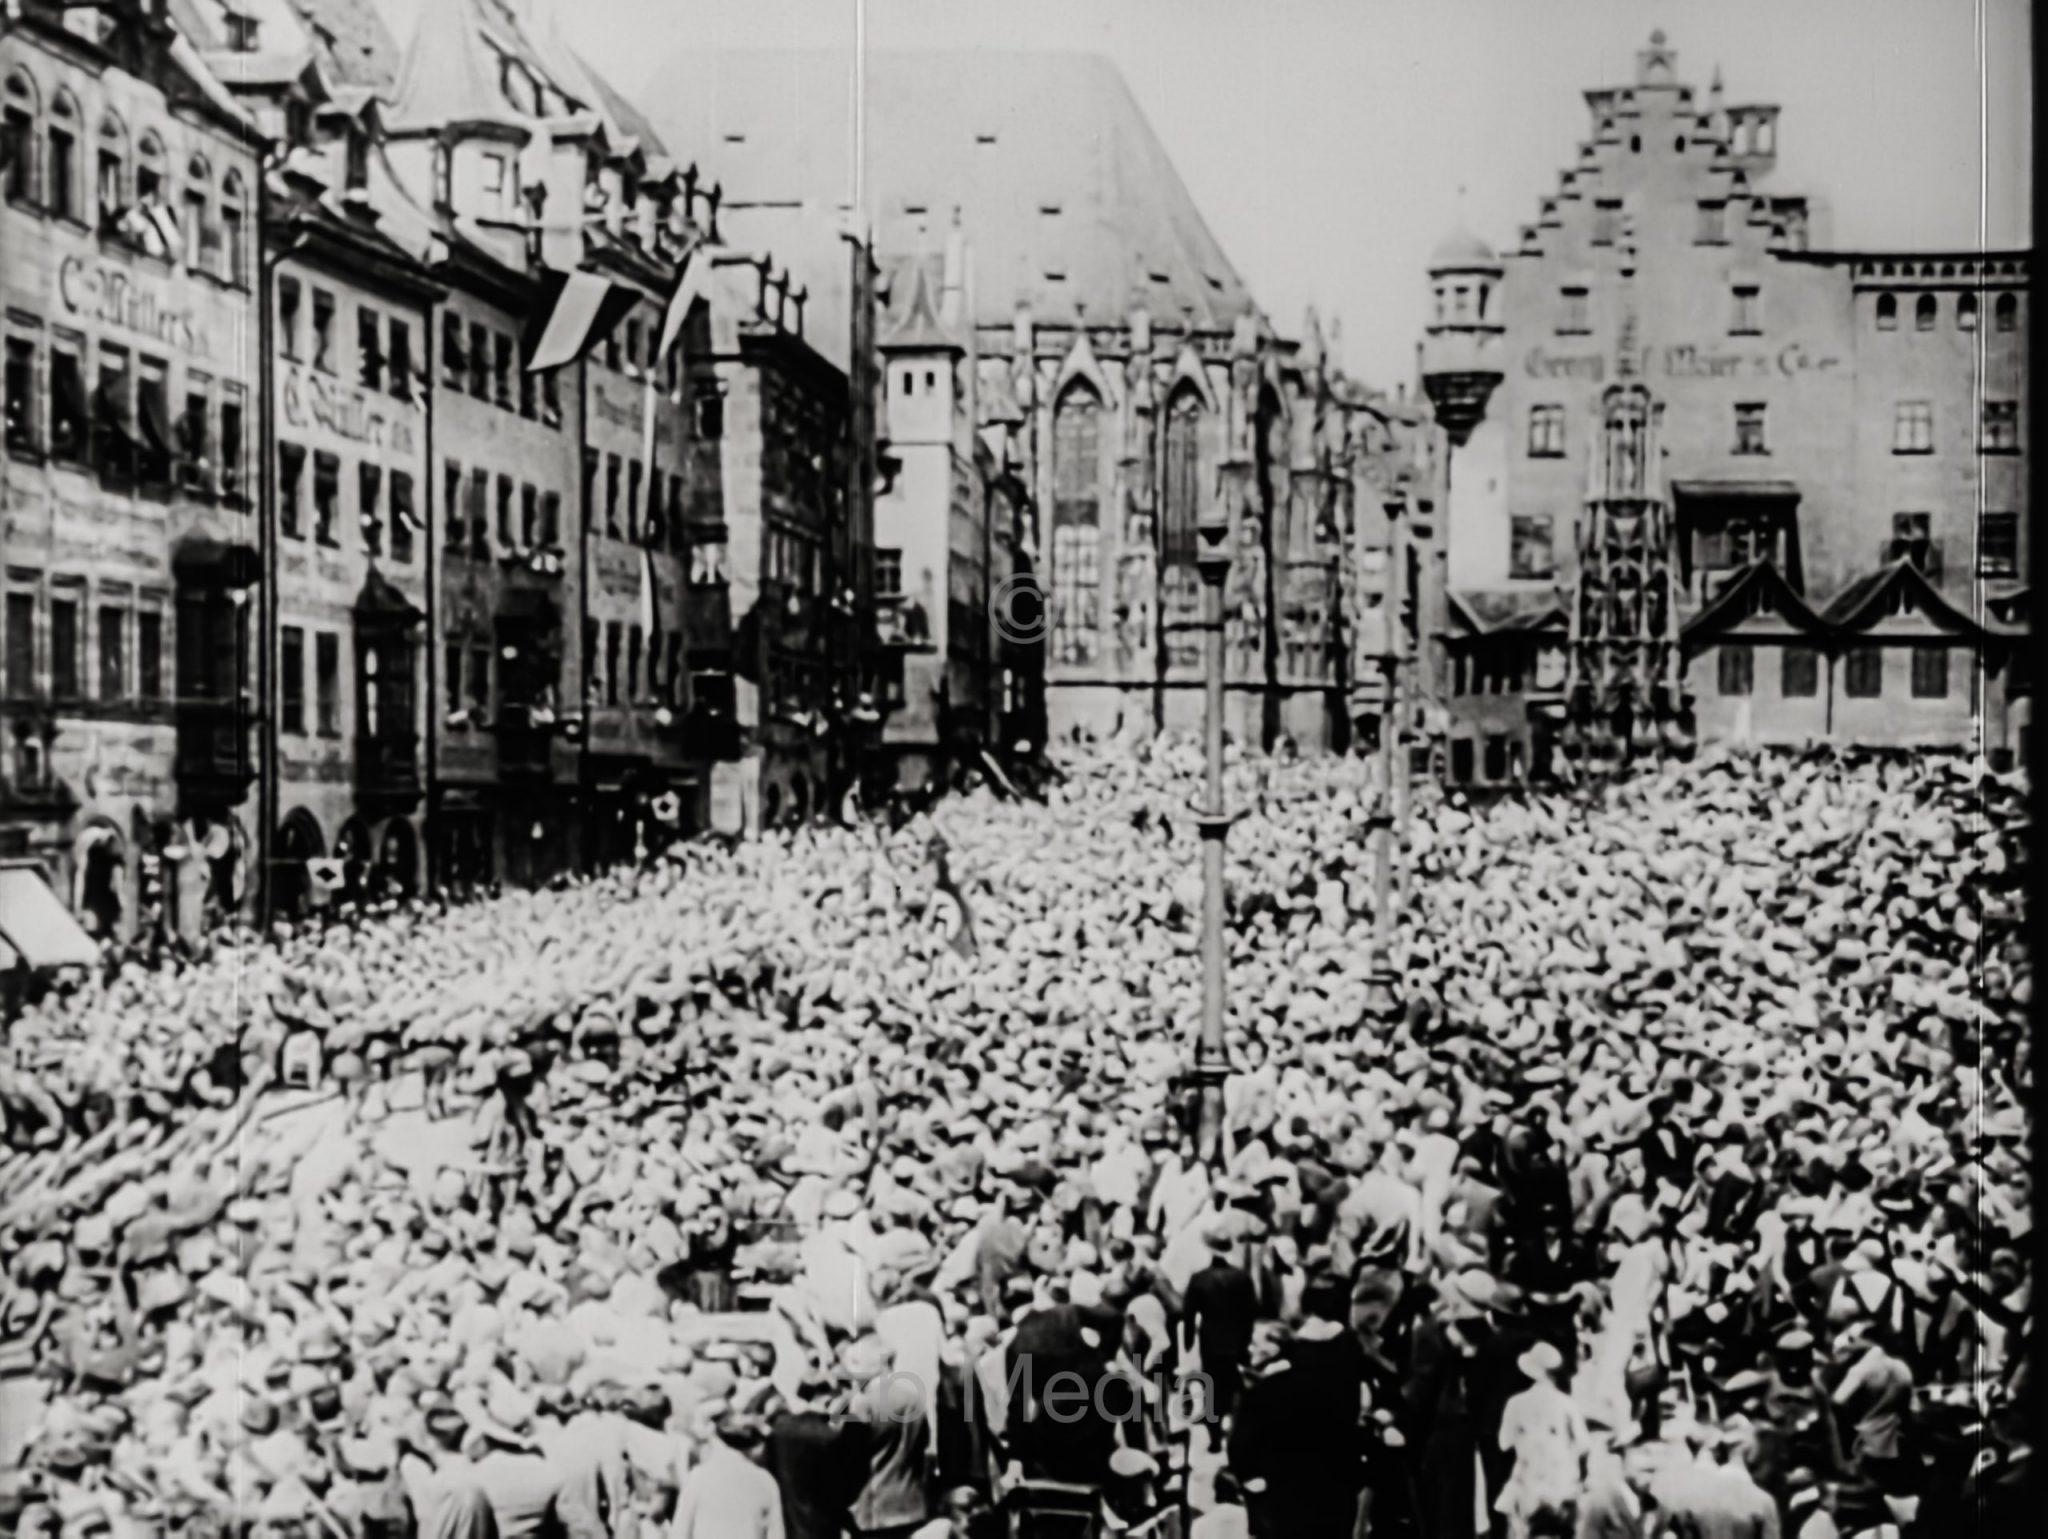 NSDAP Parteitag Nürnberg 1929, Menschenmenge am Hauptmarkt